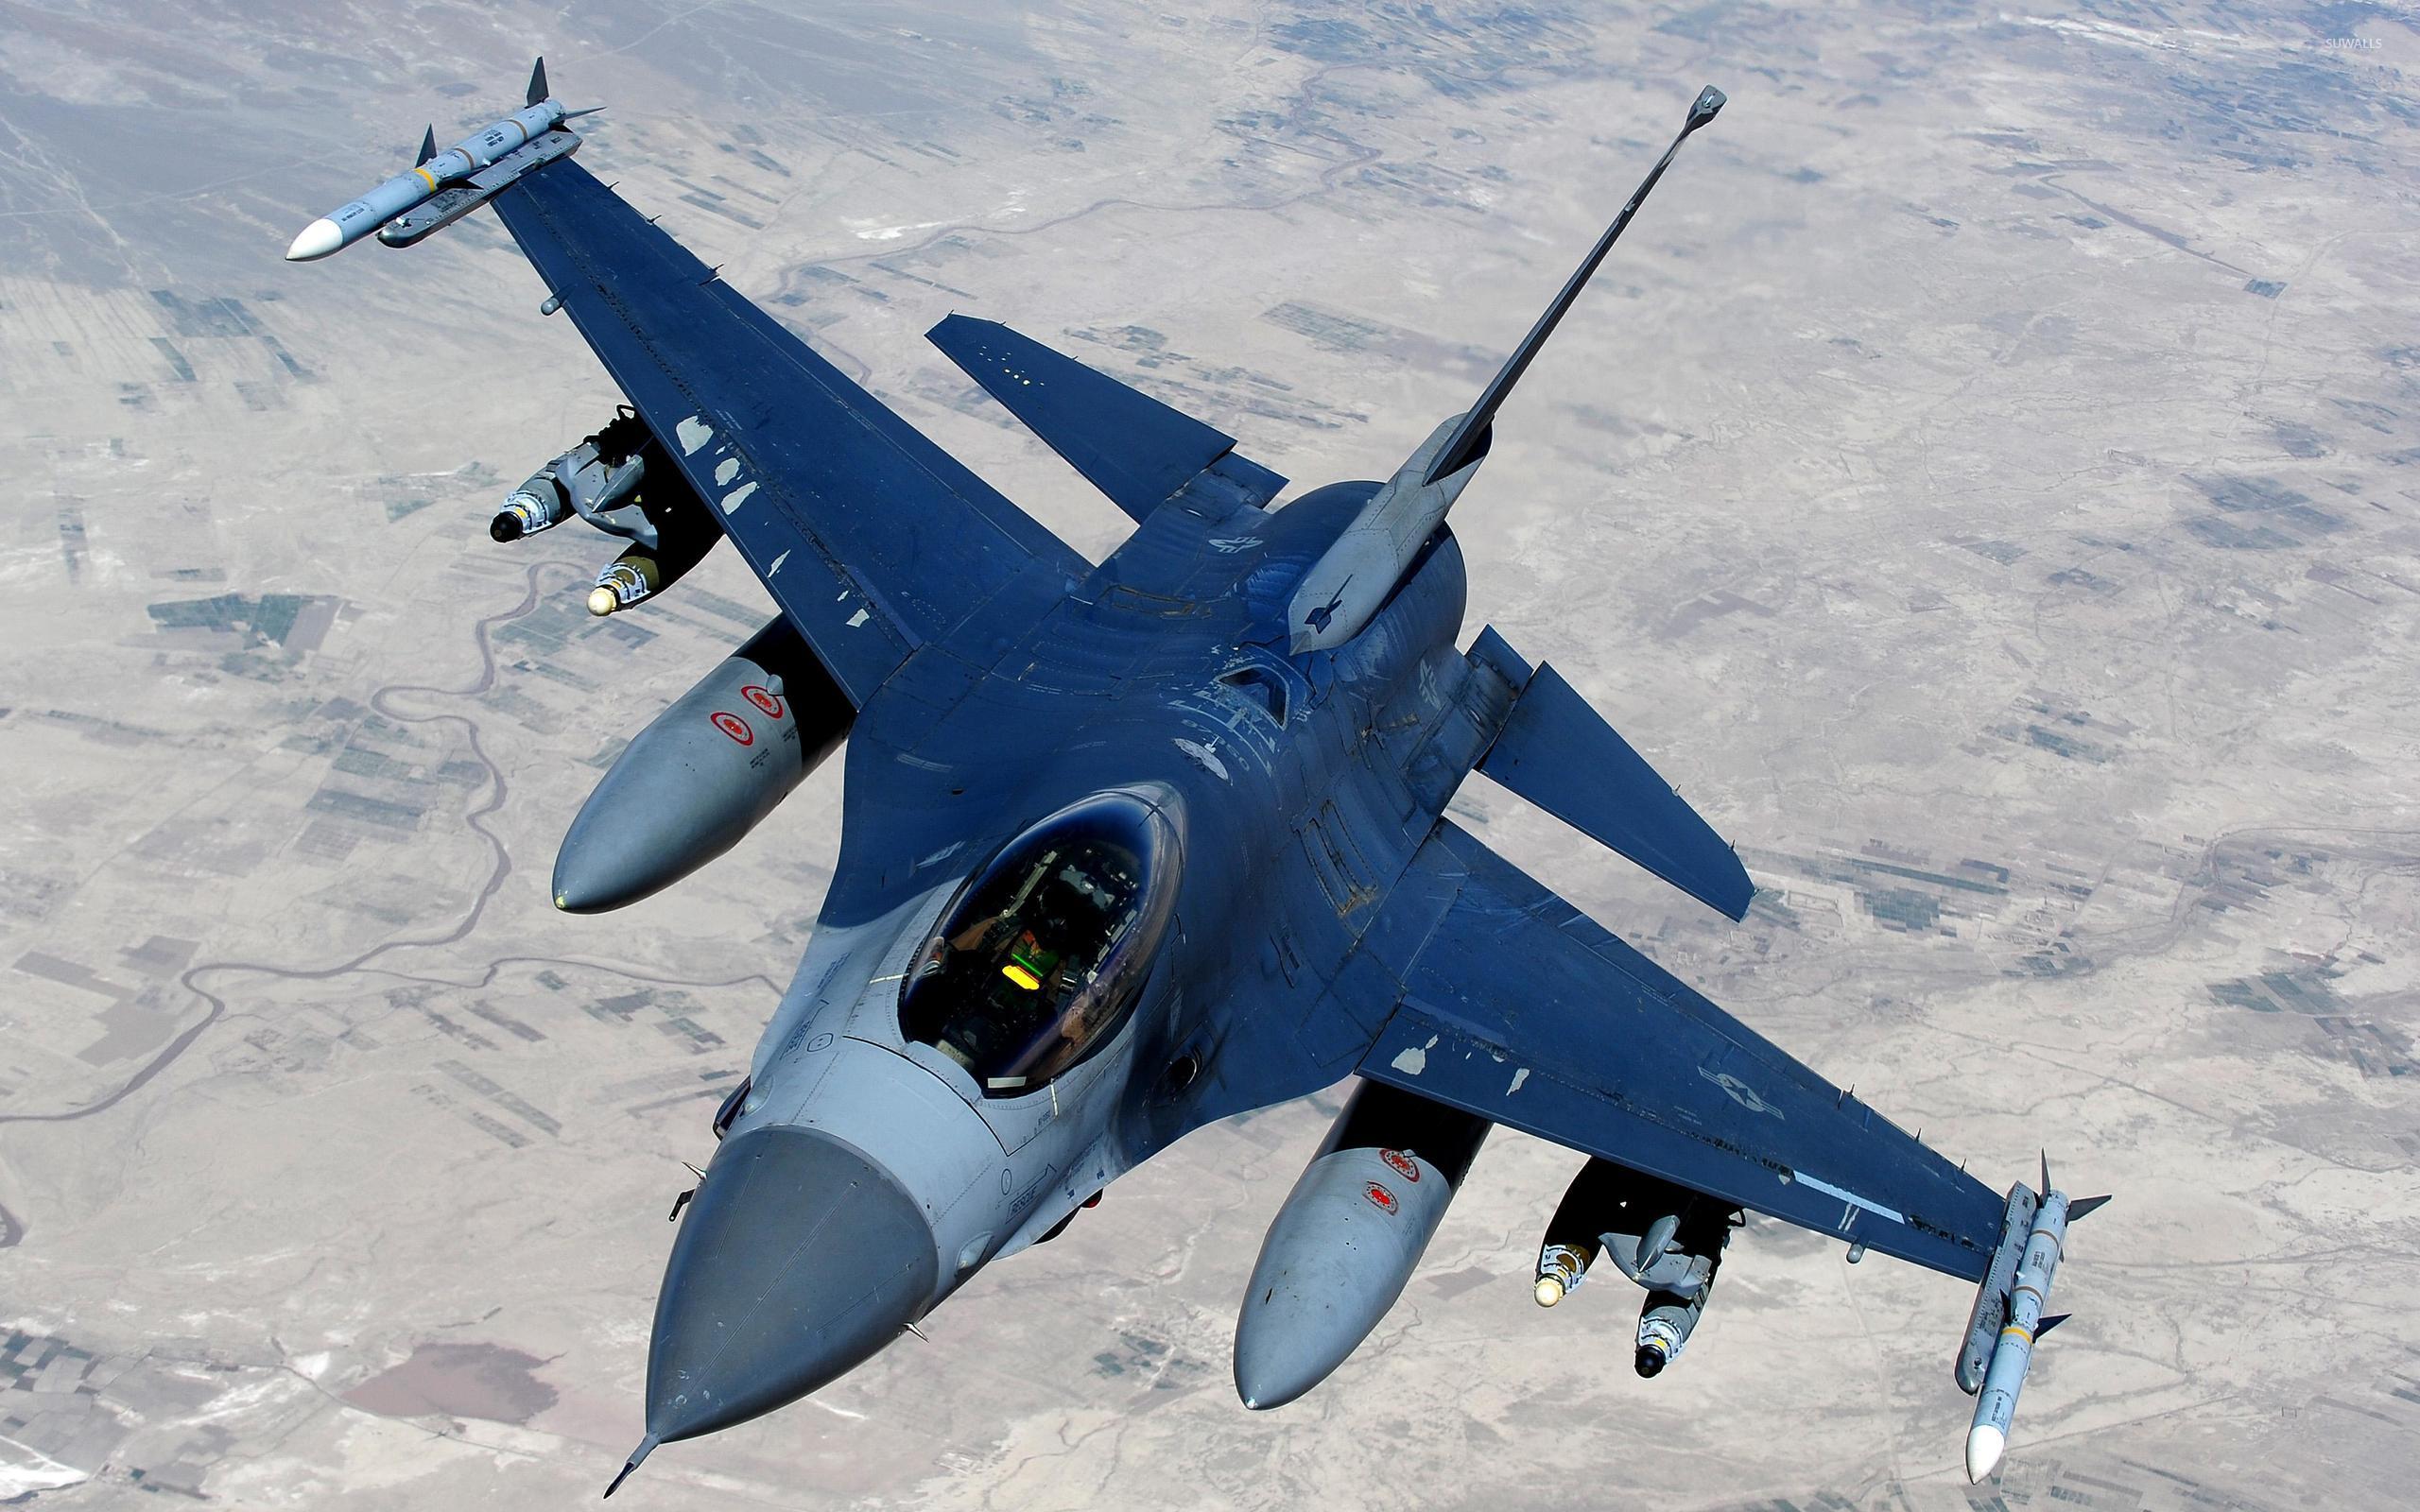 General Dynamics F-16 Fighting Falcon [6] Wallpaper